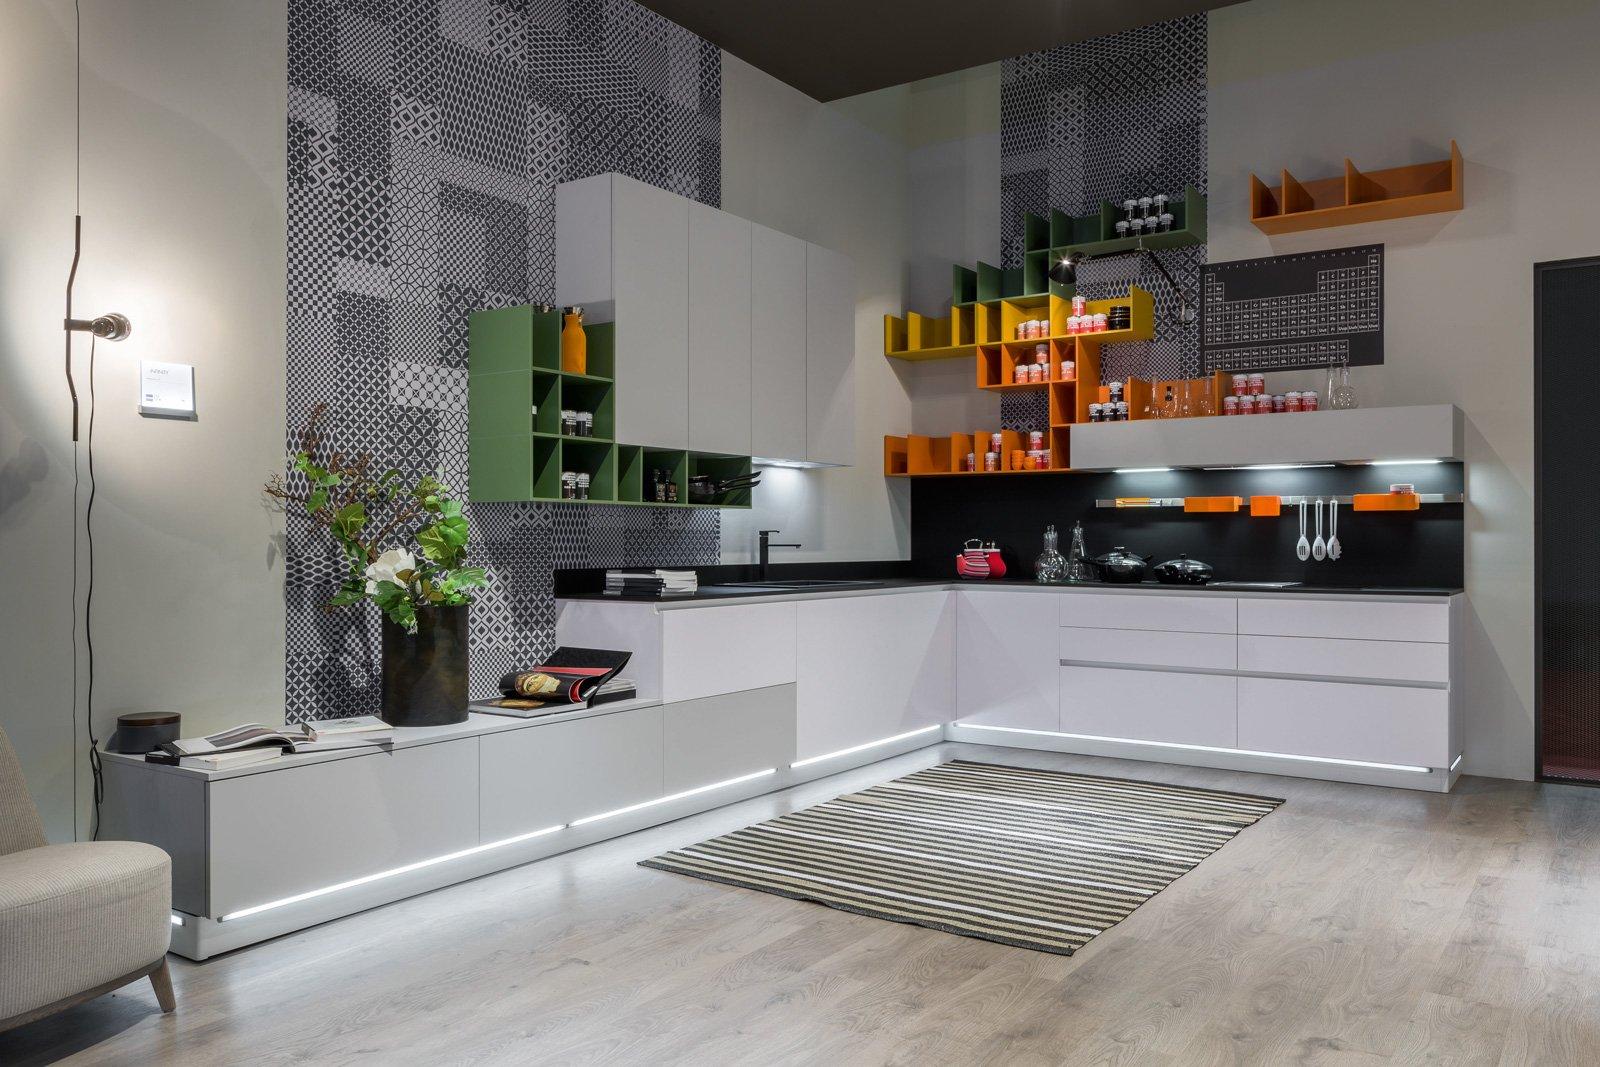 Pensili X Cucina Ikea | madgeweb.com idee di interior design